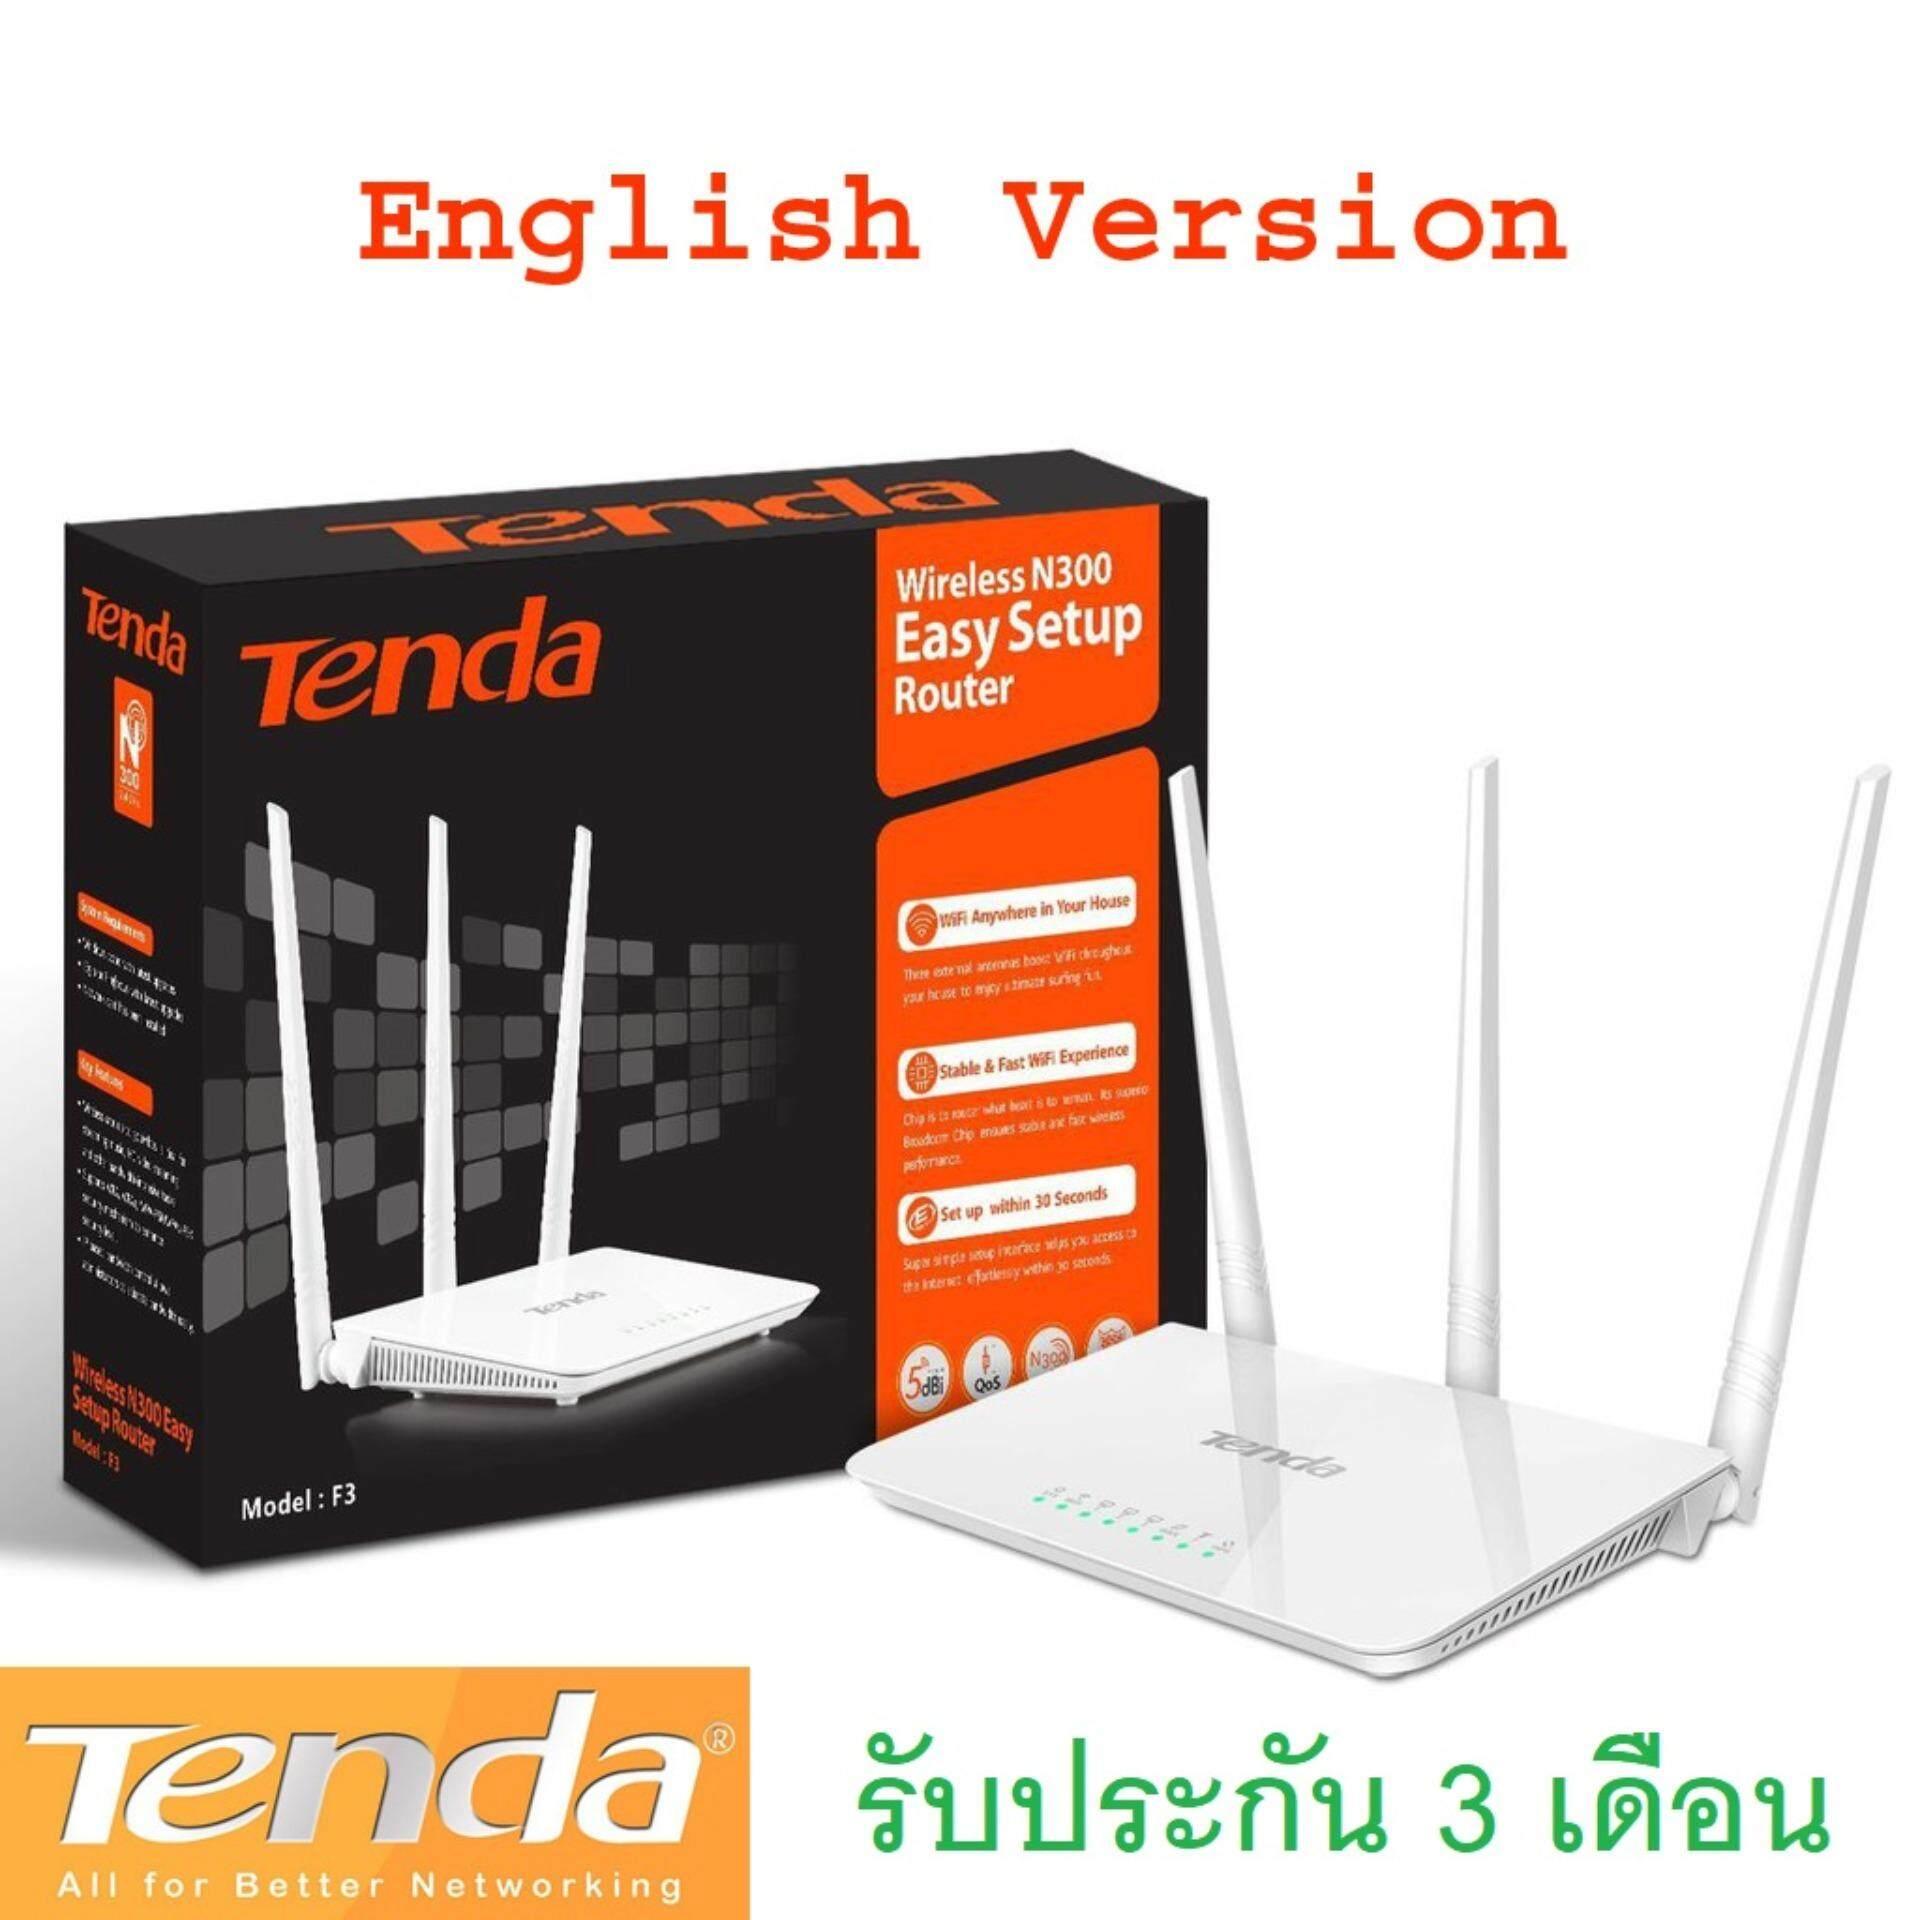 Tenda F3 English Version N300 3 Antenna Wireless Router / Repeater.